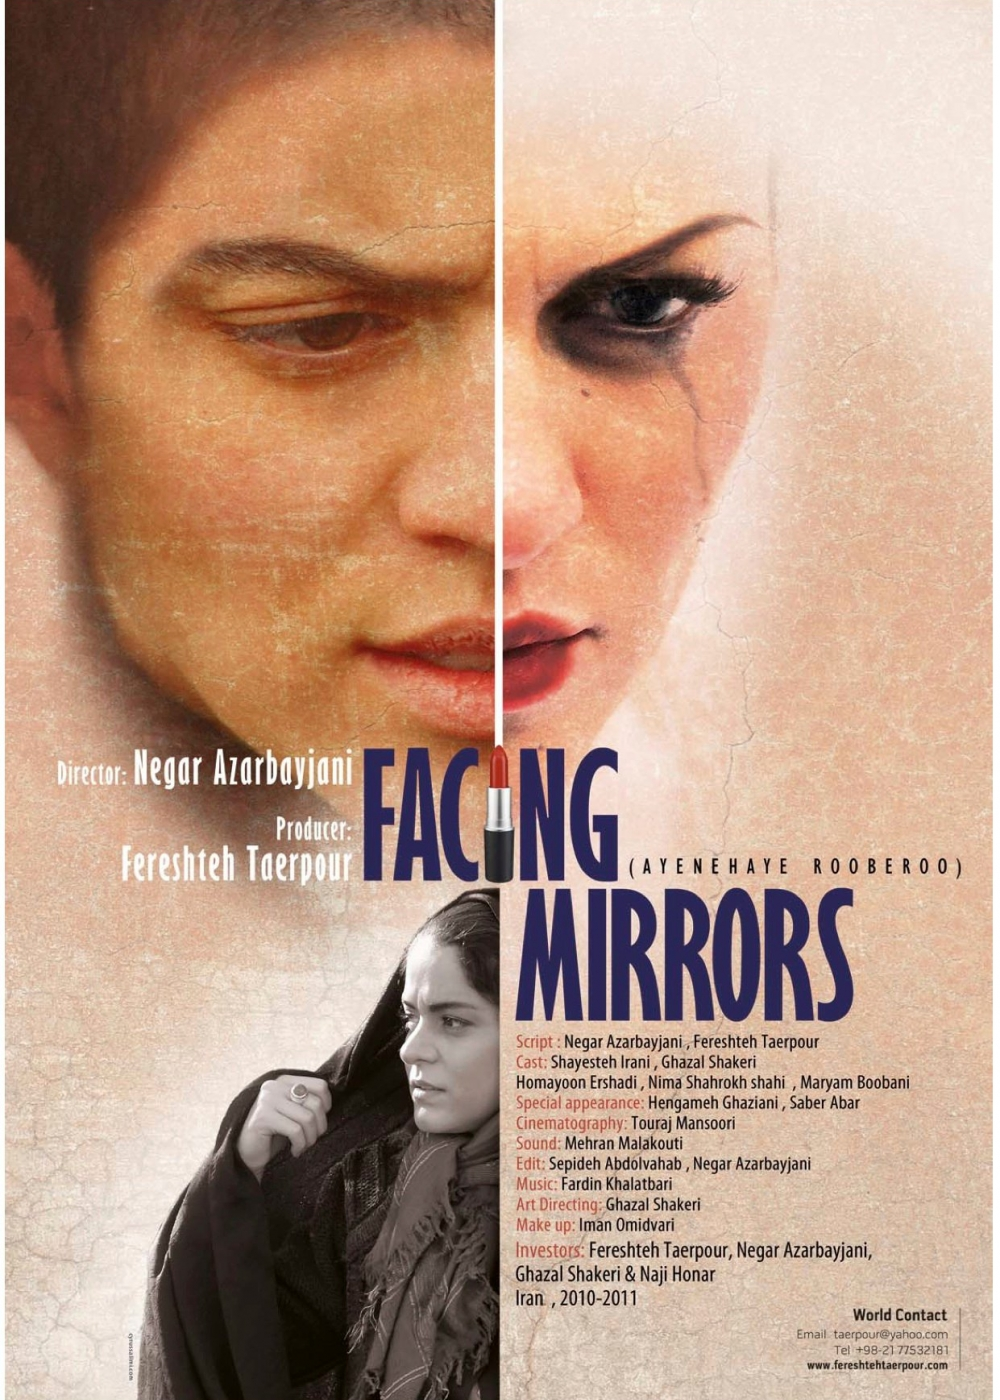 Iranische Film